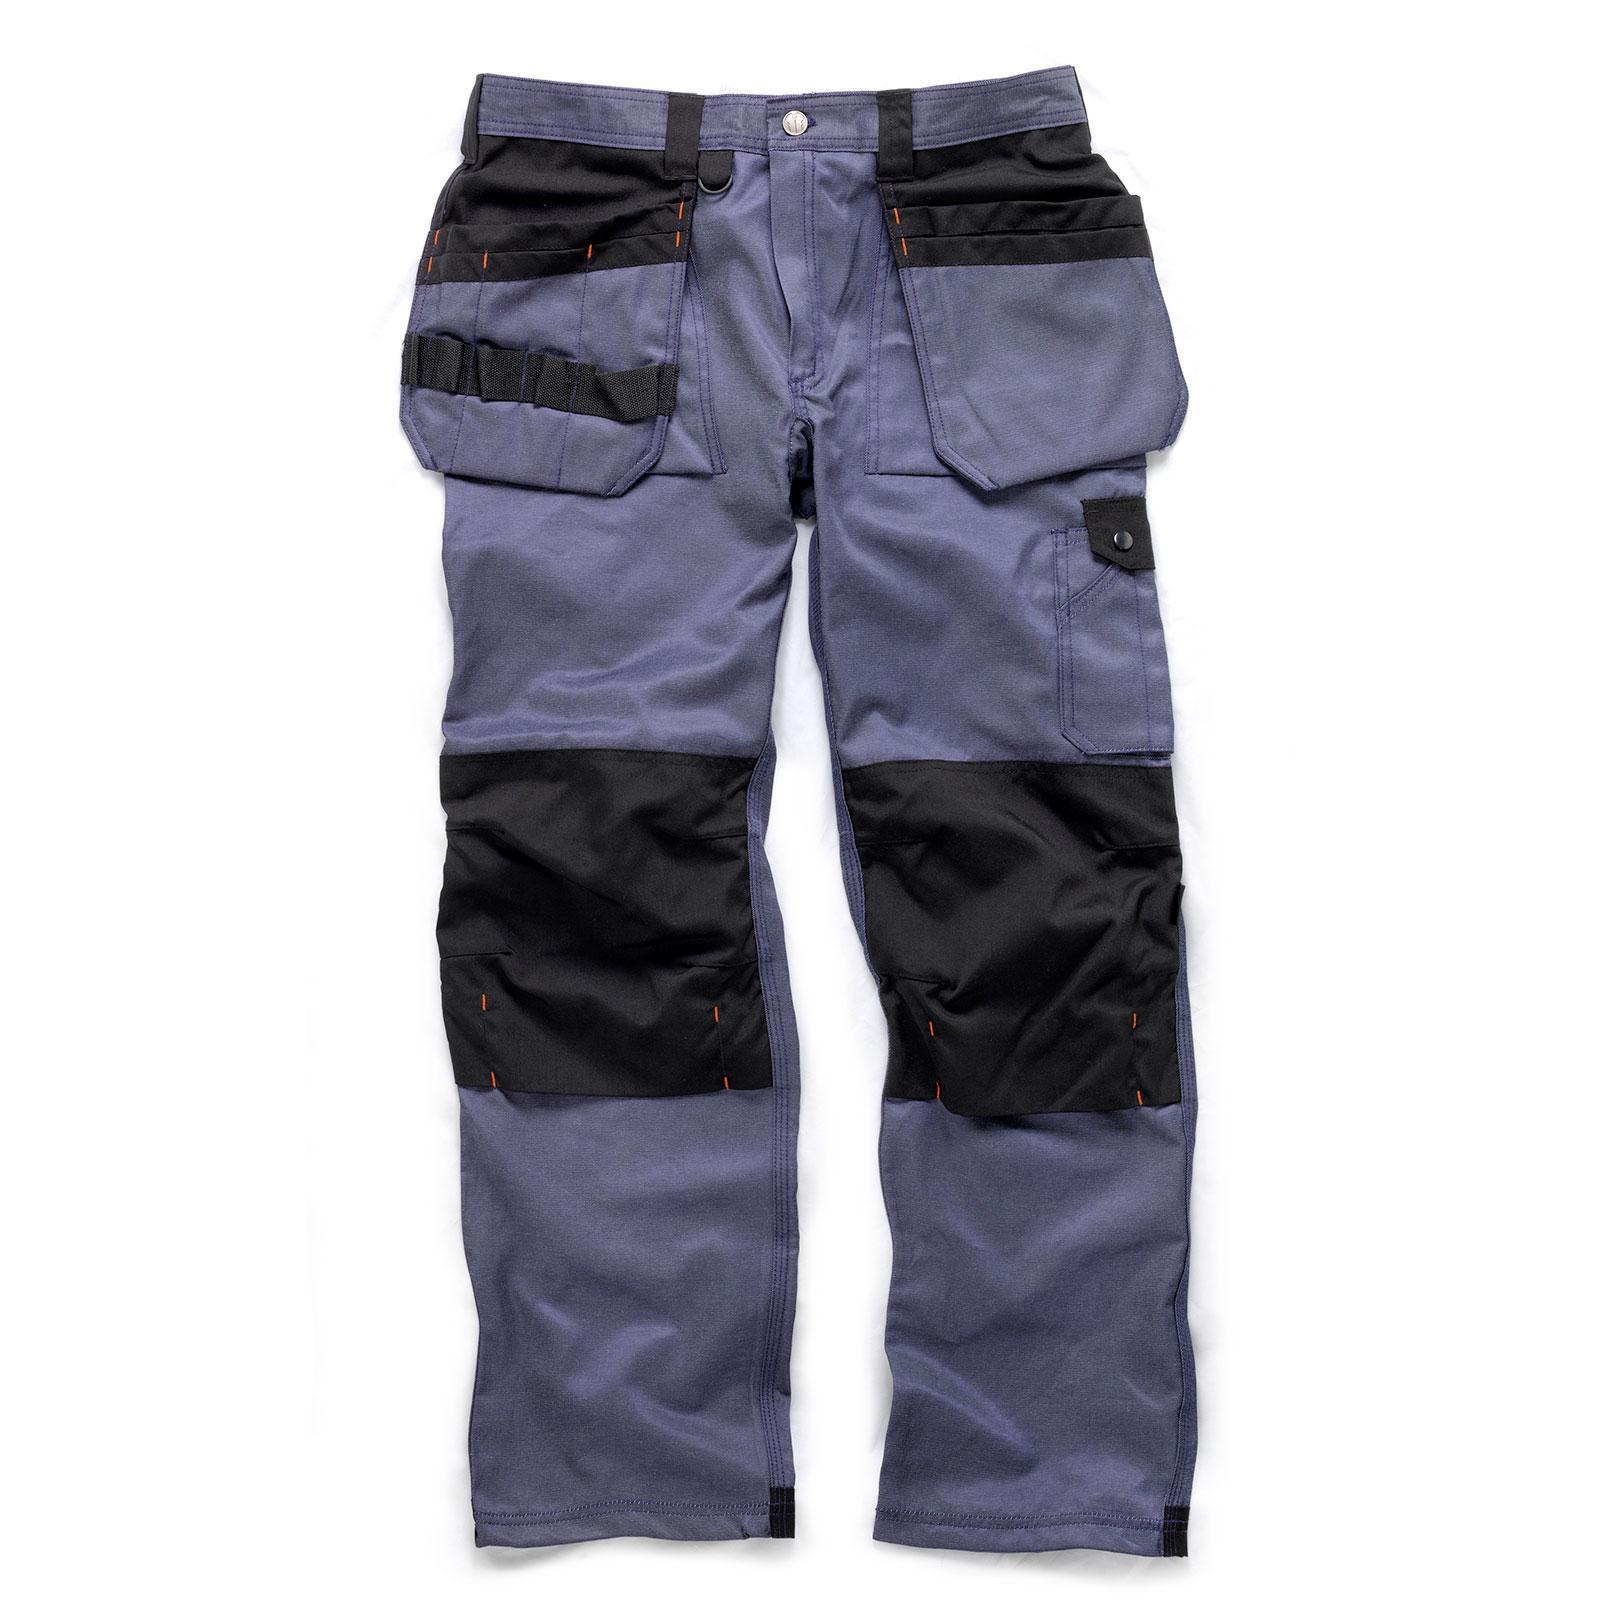 Quartz Trousers